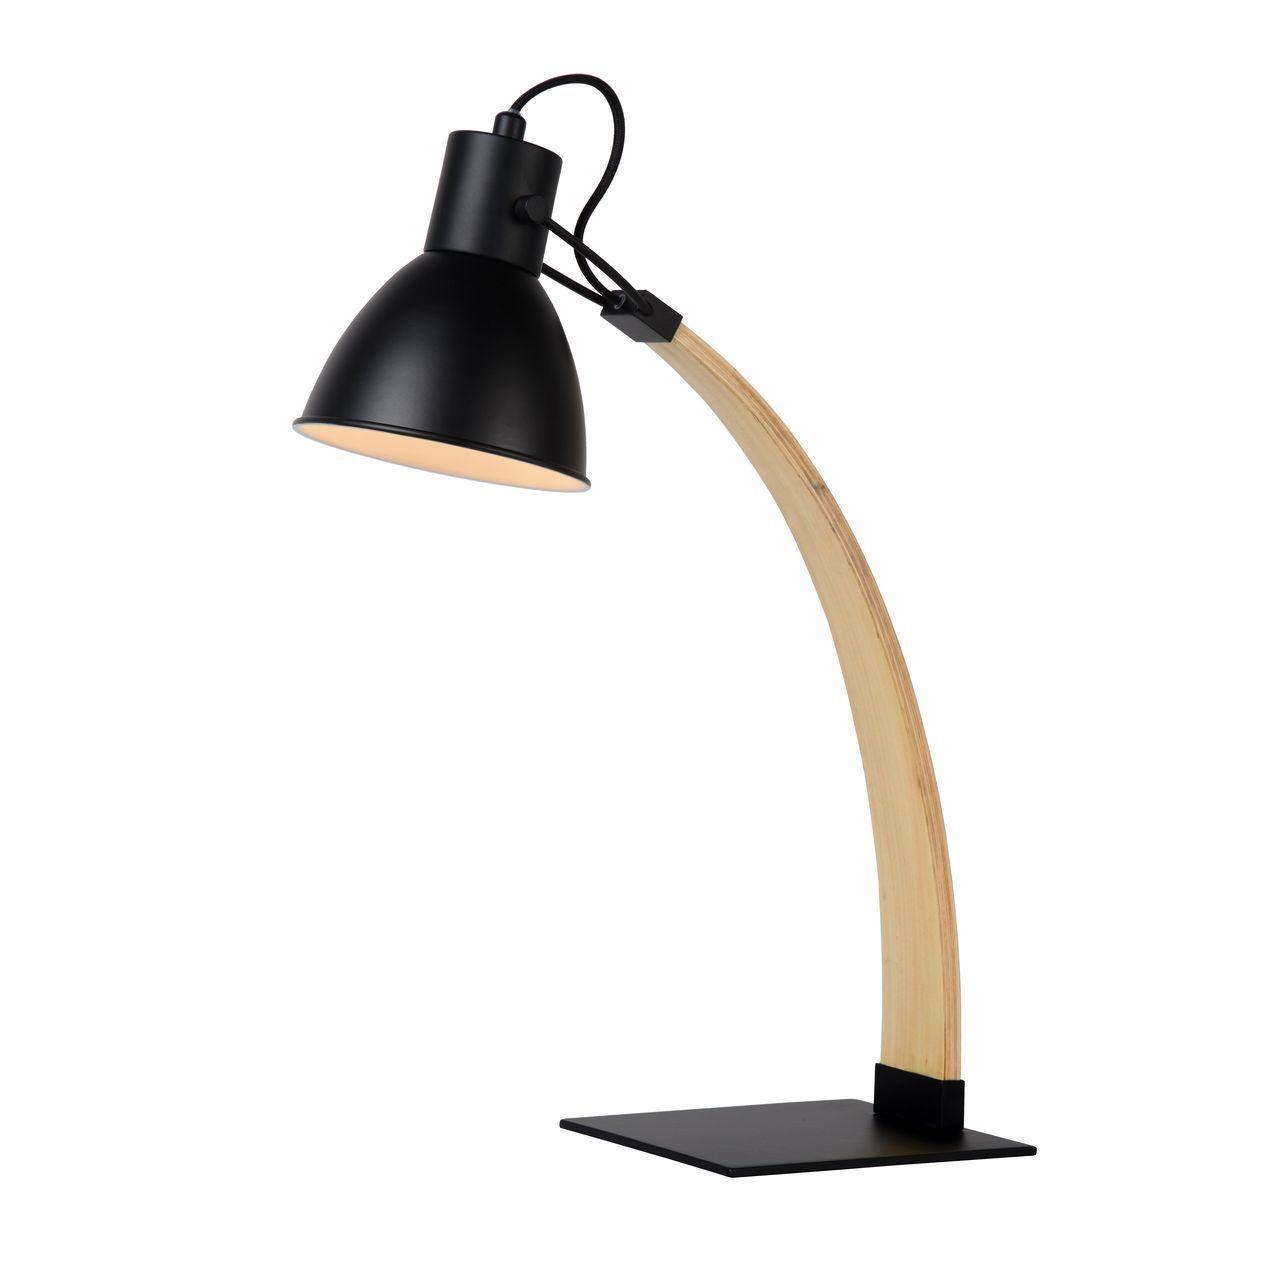 Настольная лампа Lucide Curf 03613/01/30 торшер lucide curf 03713 01 30